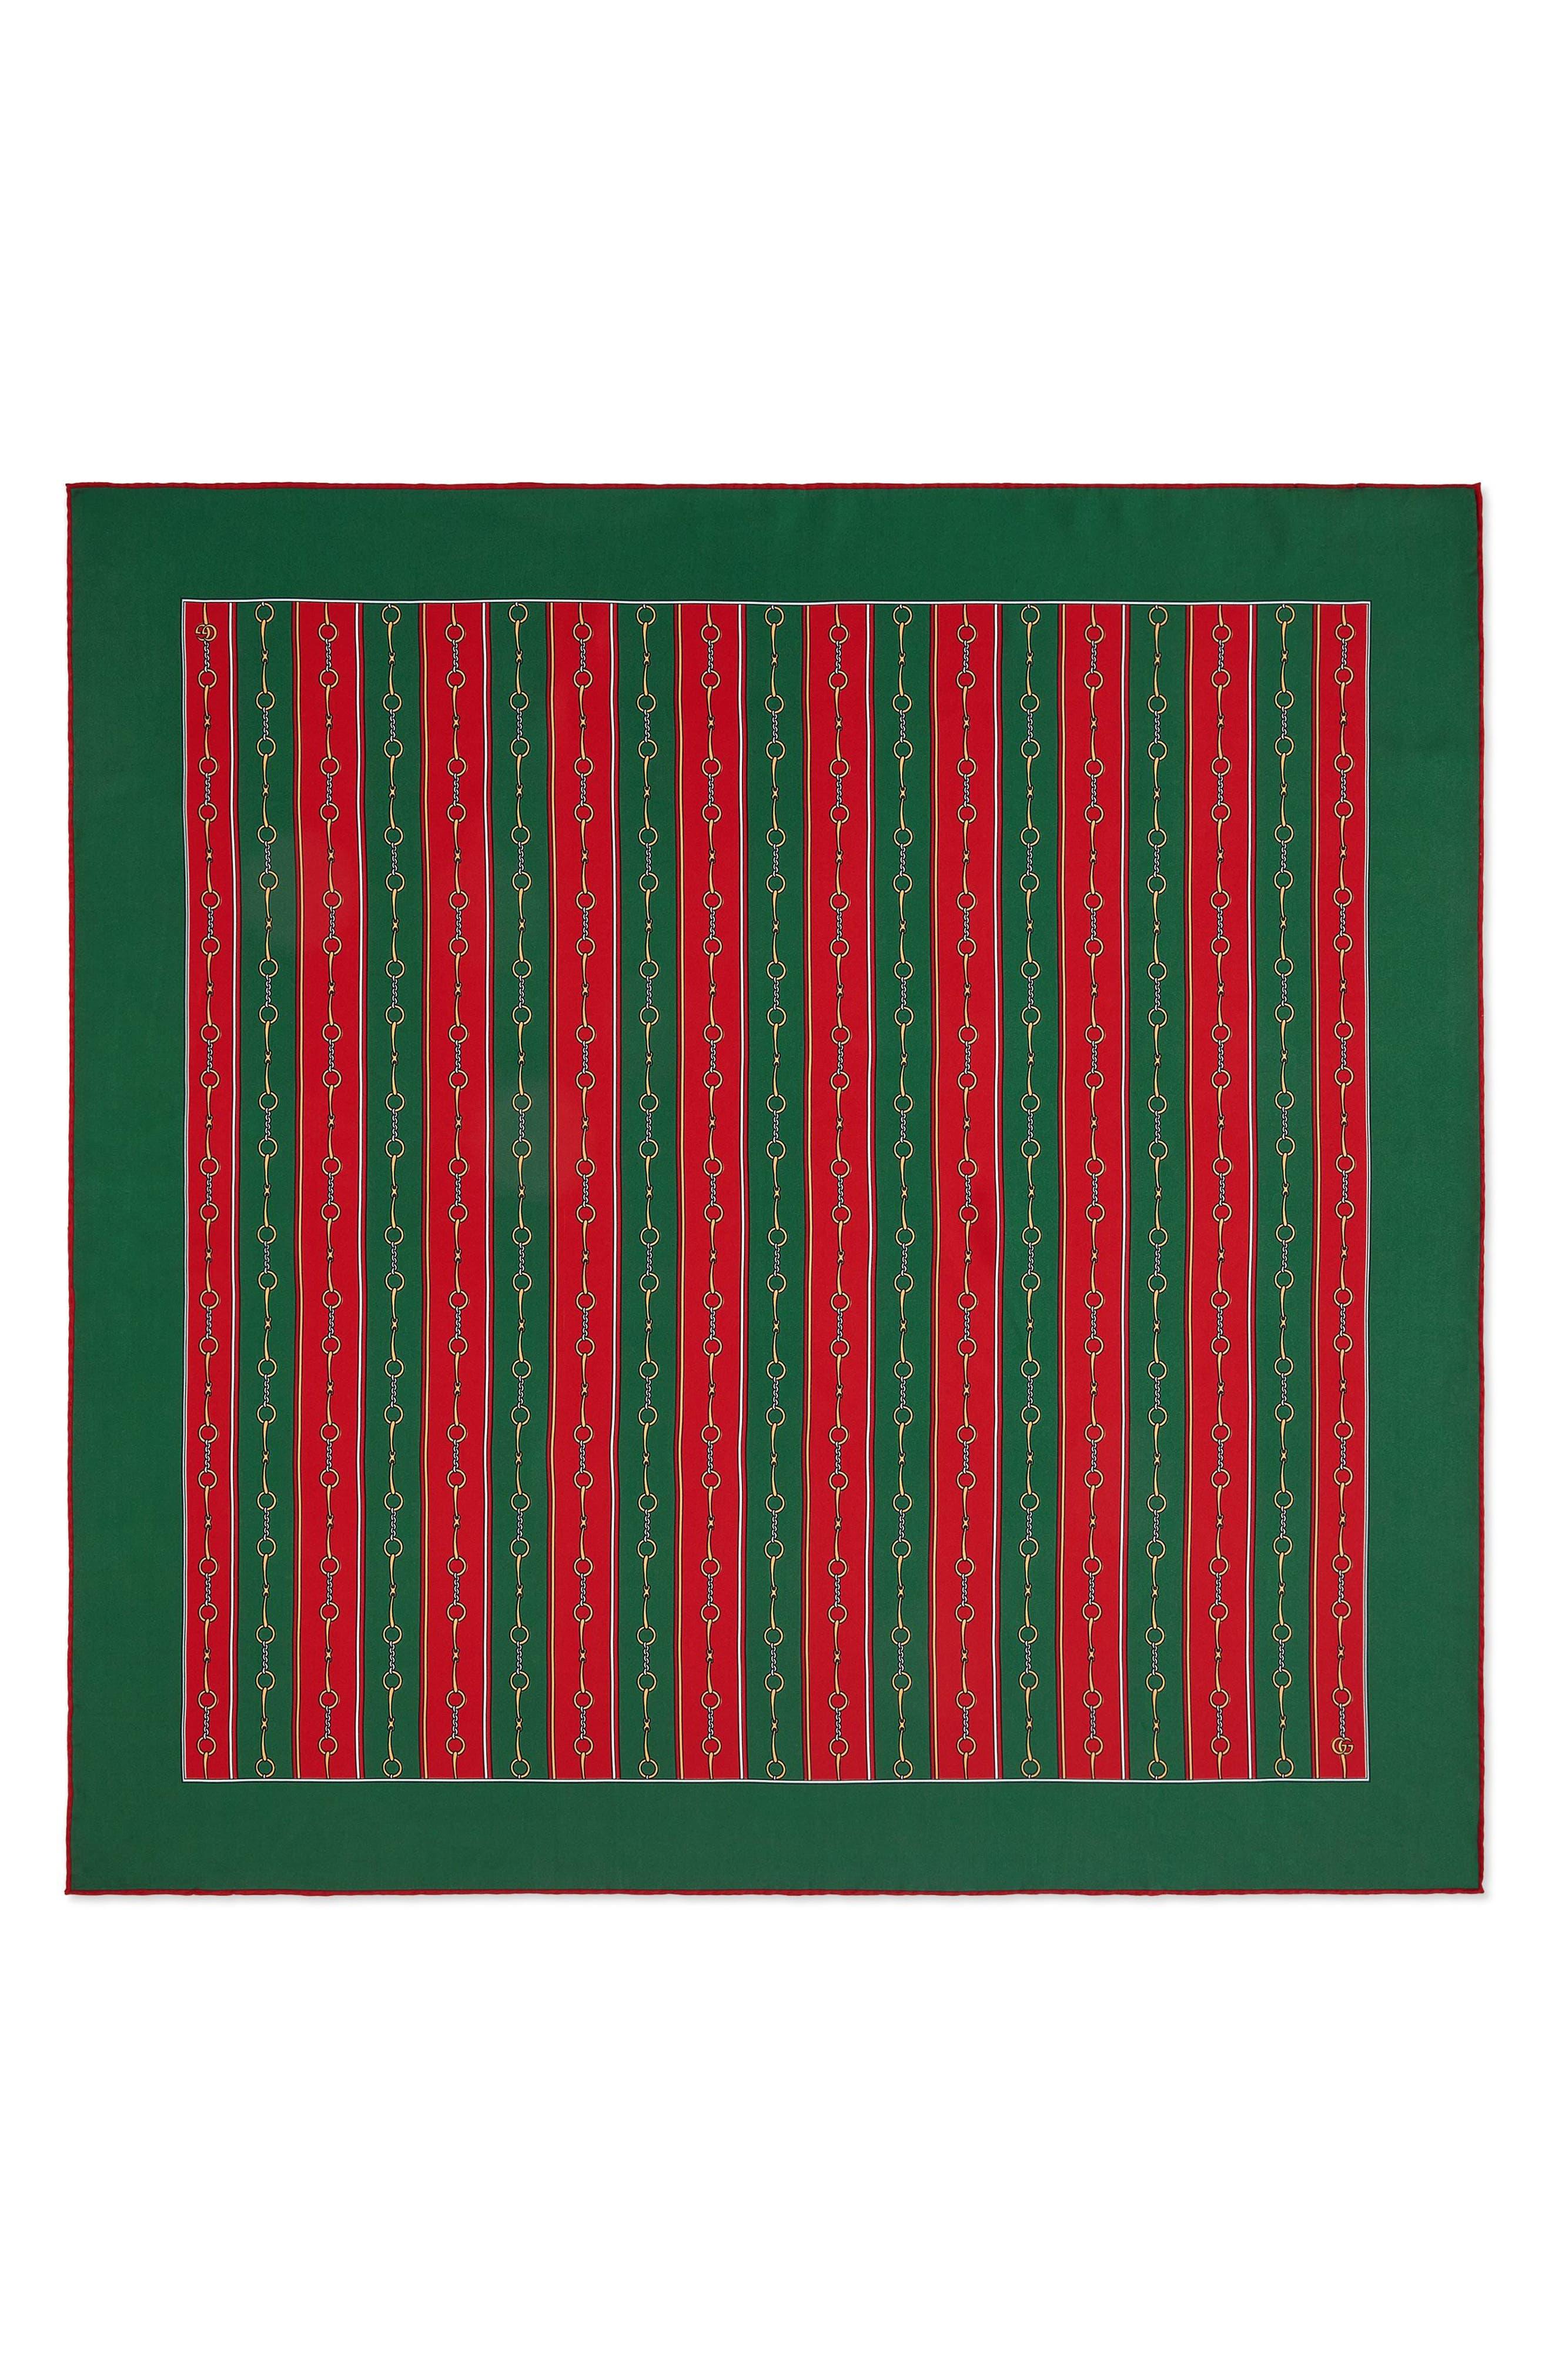 GUCCI, Stripe Horsebit Print Silk Scarf, Main thumbnail 1, color, GREEN/ RED